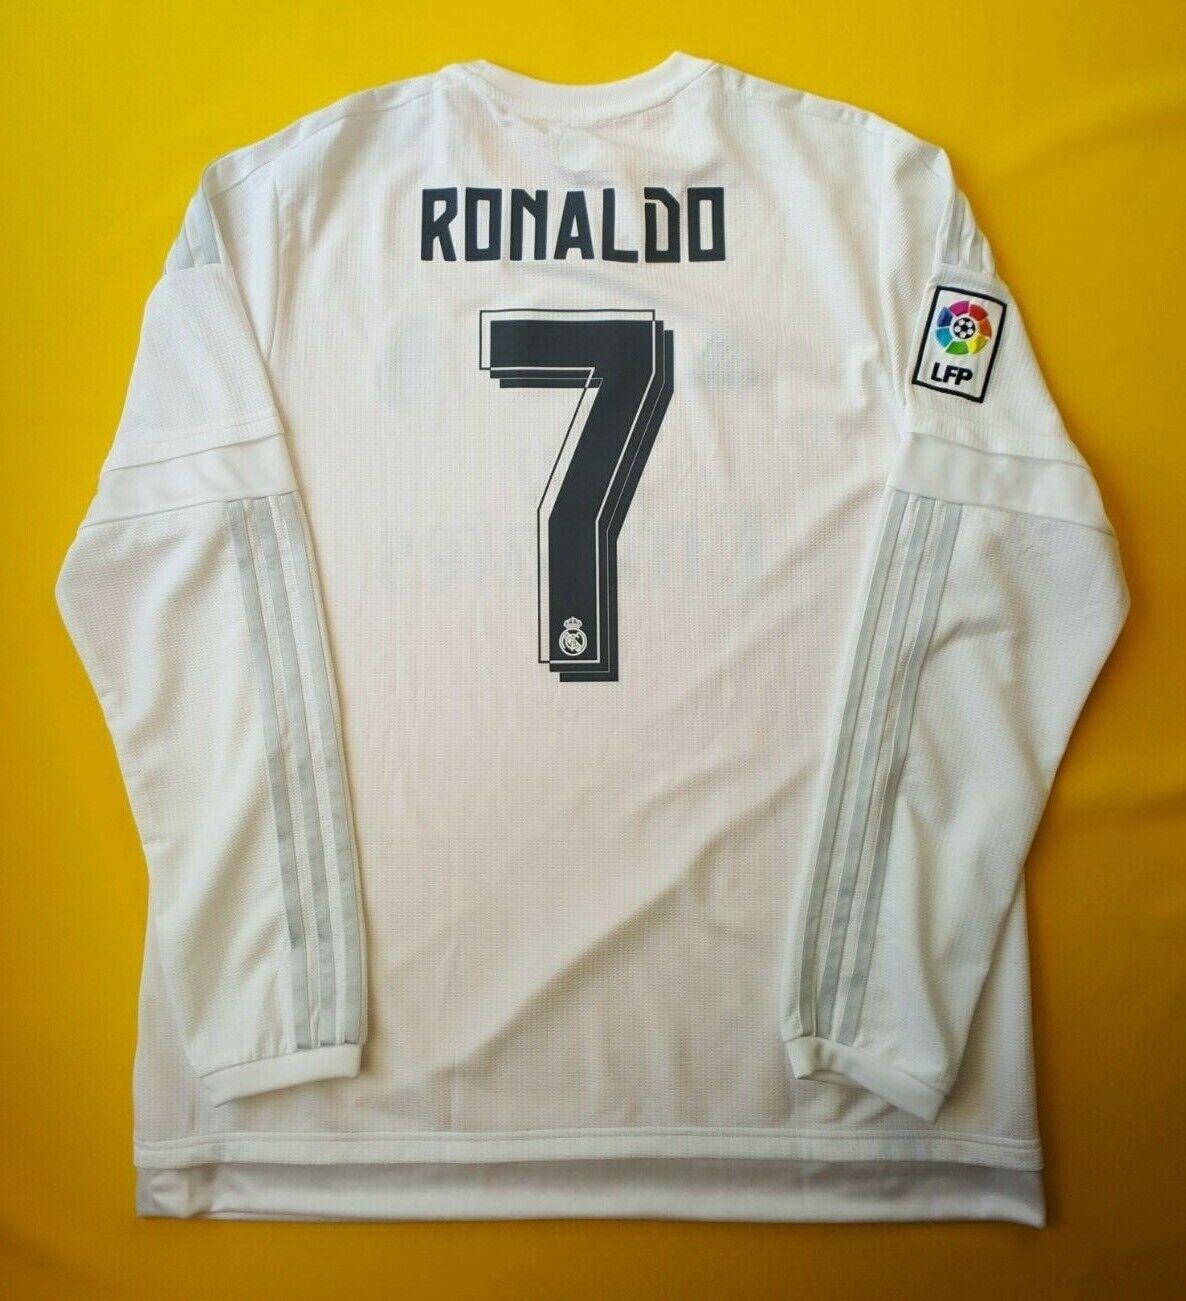 5+ 5 Ronaldo Real Madrid Jersey Camisa 2016 XL 2015 AK2495 De Fútbol Adidas ig93